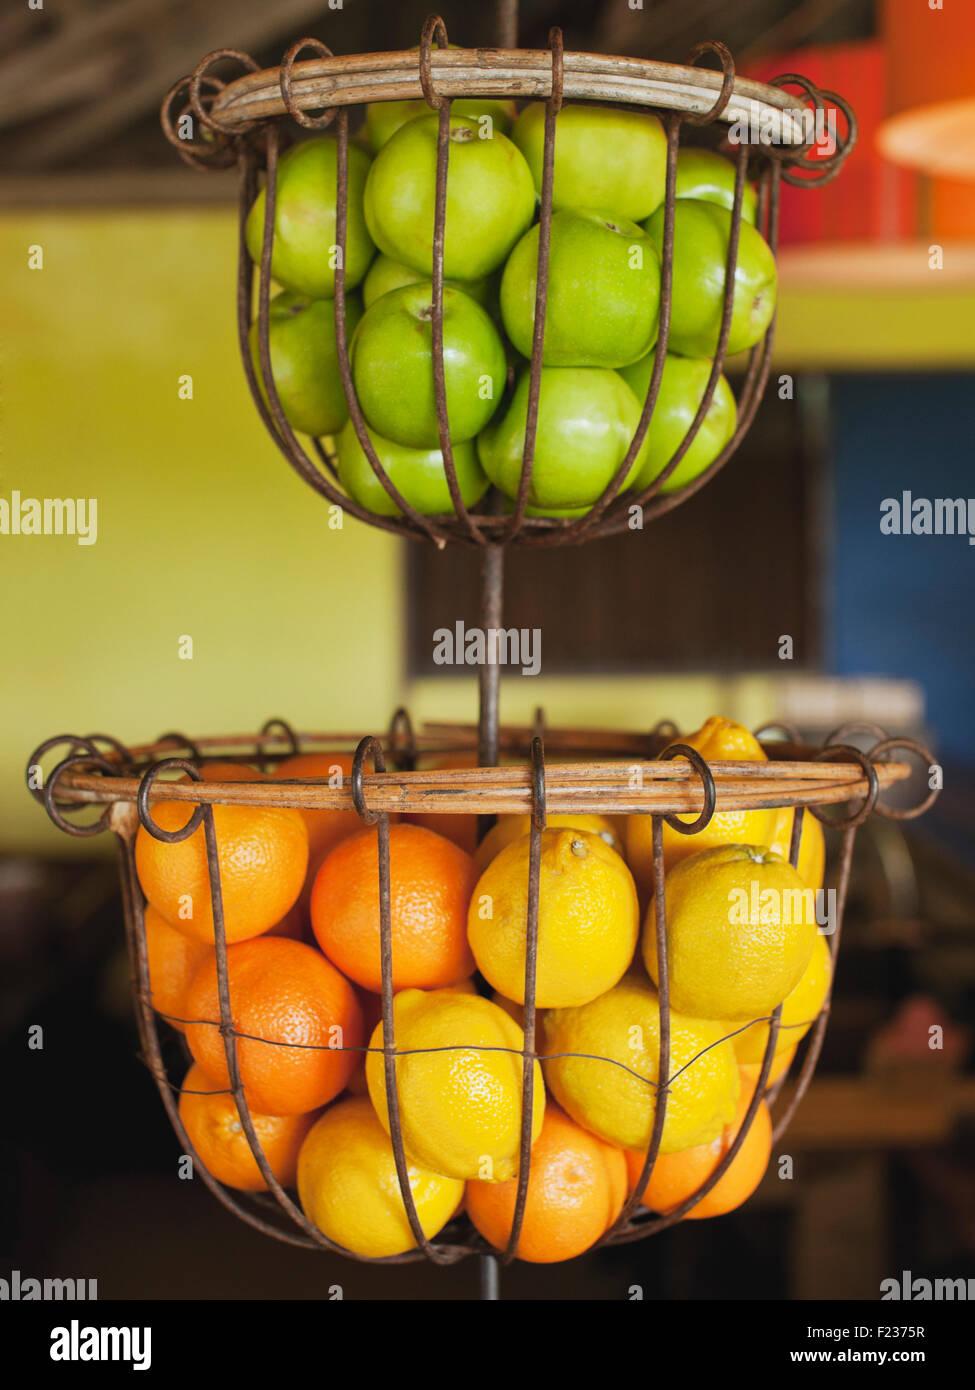 Baskets of green apples, Oranges, and lemons at NAM Restaurant at Bon Ton Resort. Langkawi, Malaysia - Stock Image